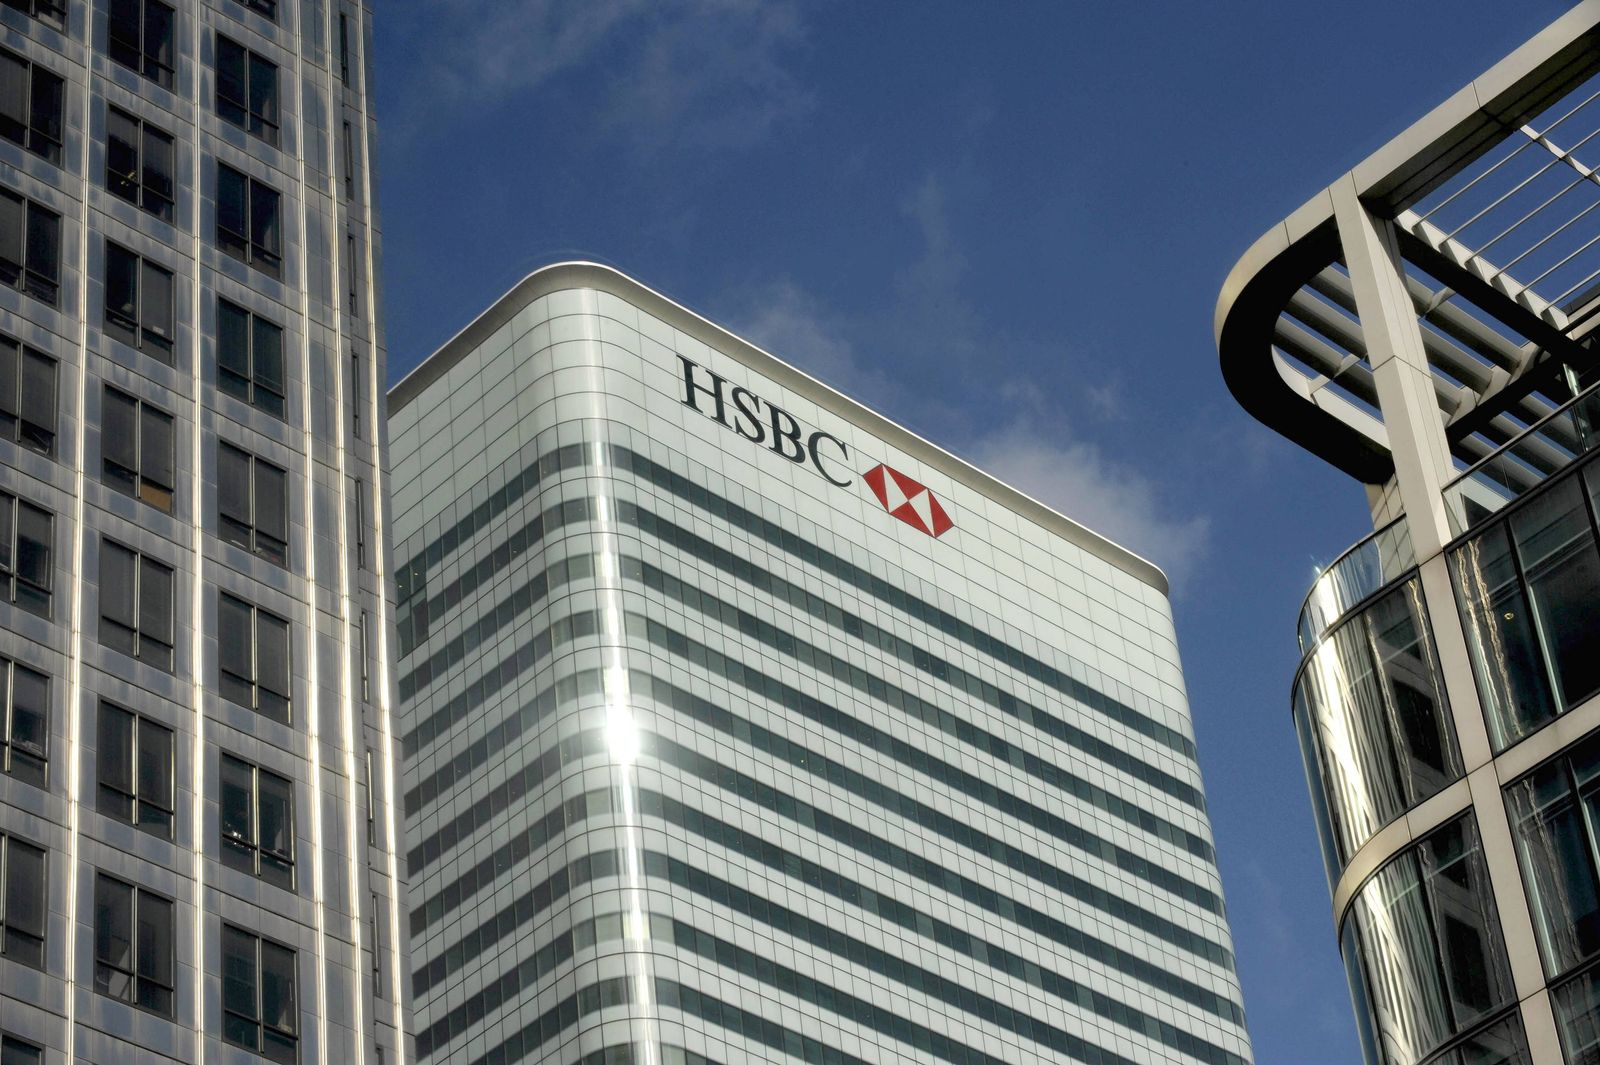 HSBC Britain